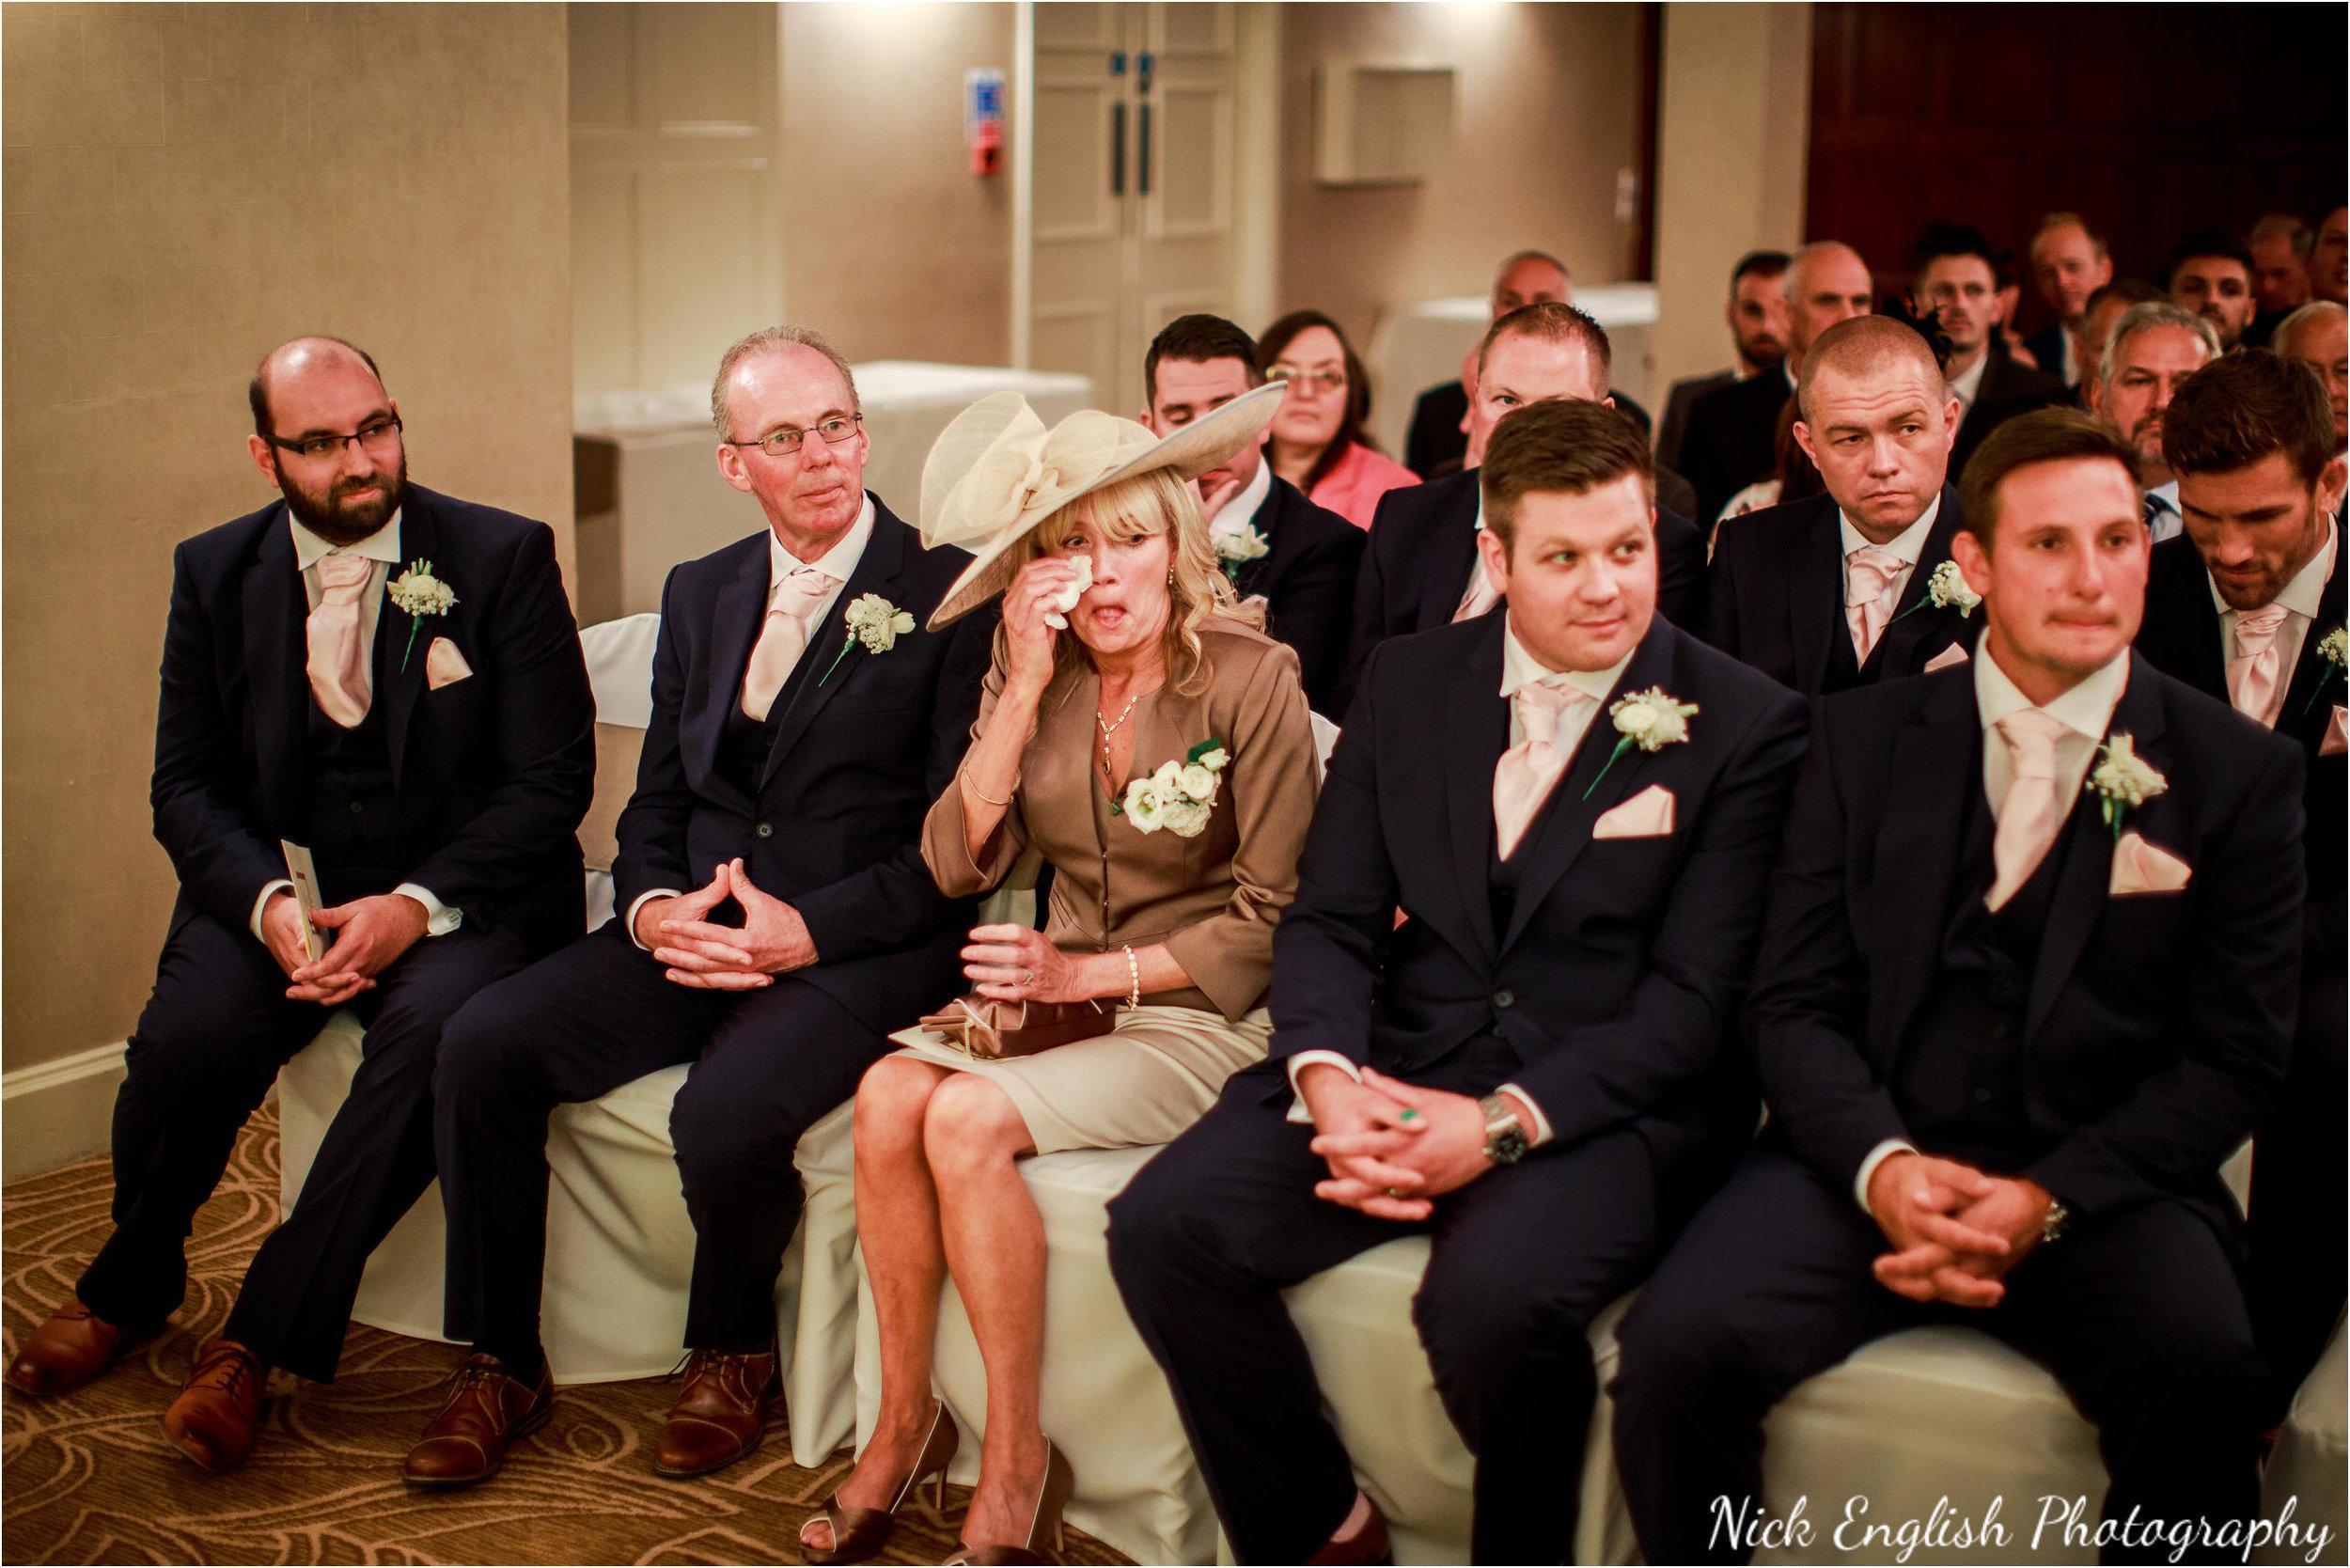 Emily David Wedding Photographs at Barton Grange Preston by Nick English Photography 70jpg.jpeg